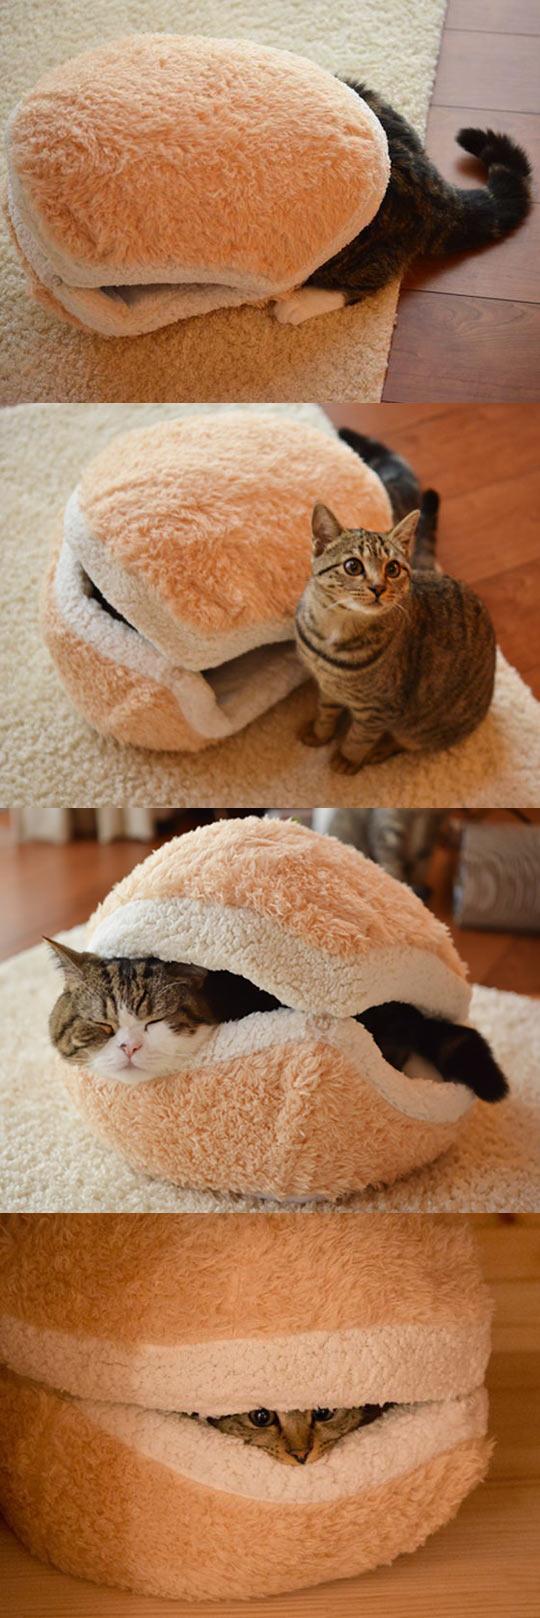 cool-cat-burger-bed-fluffy-amazing-idea